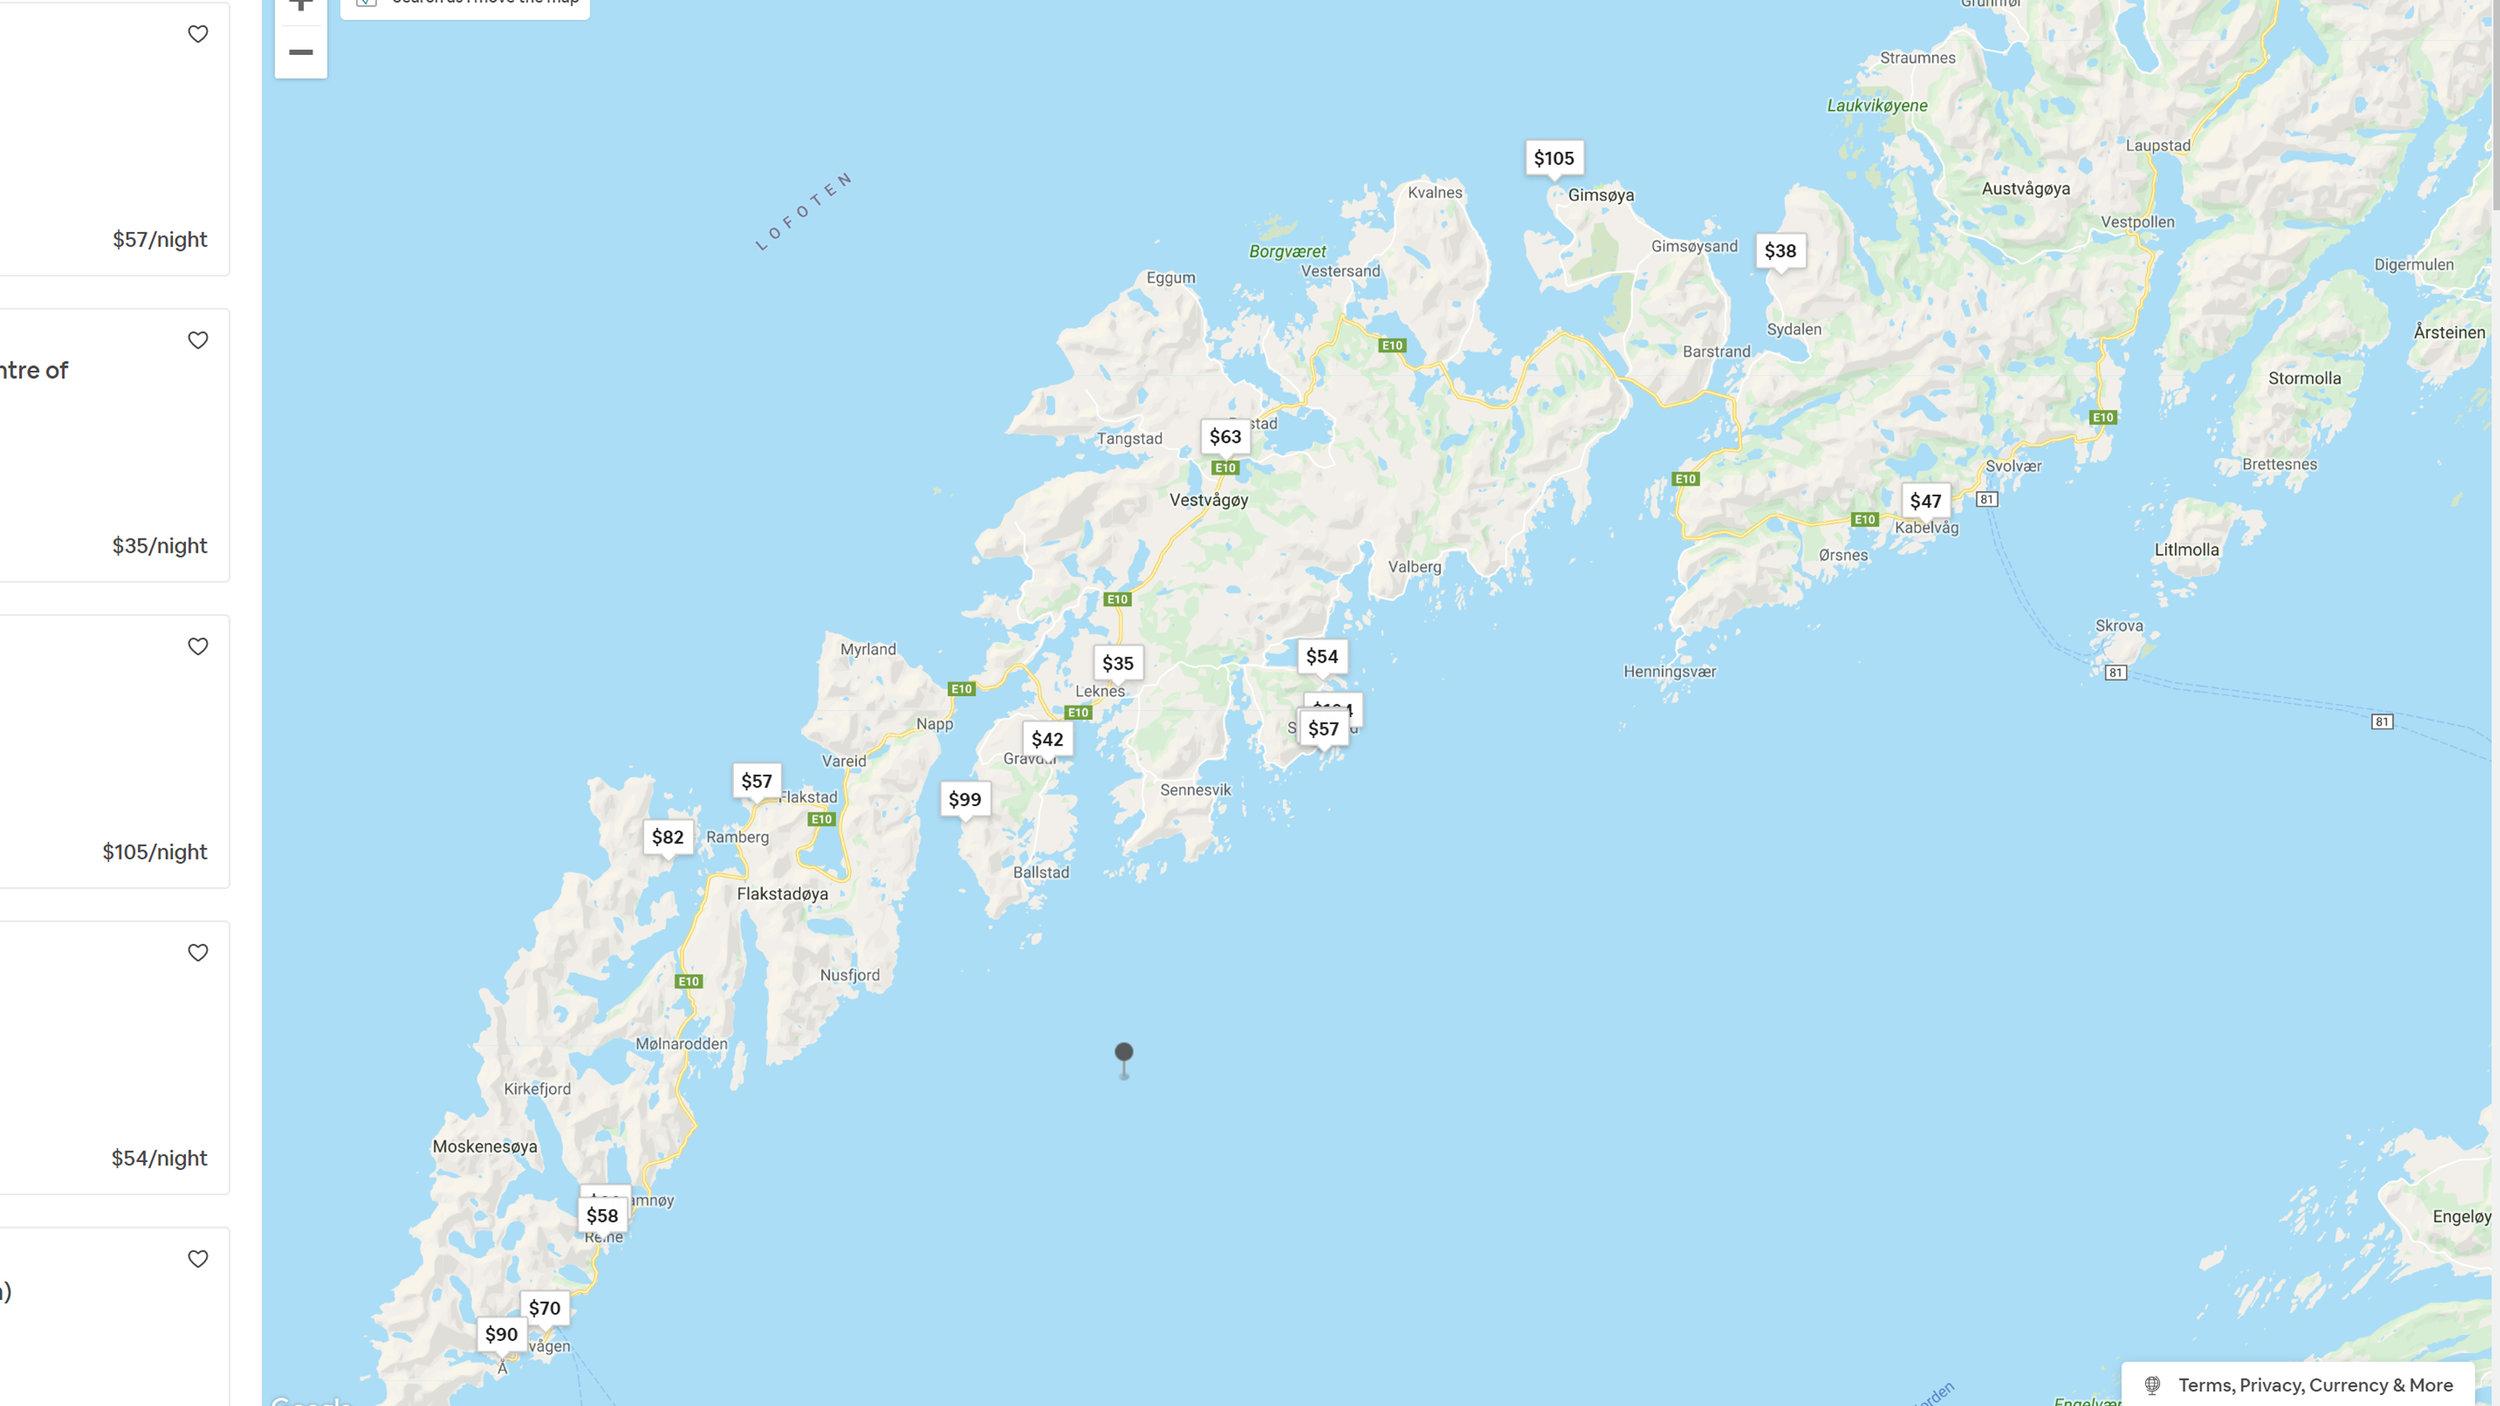 Air Bnbs in Lofoten